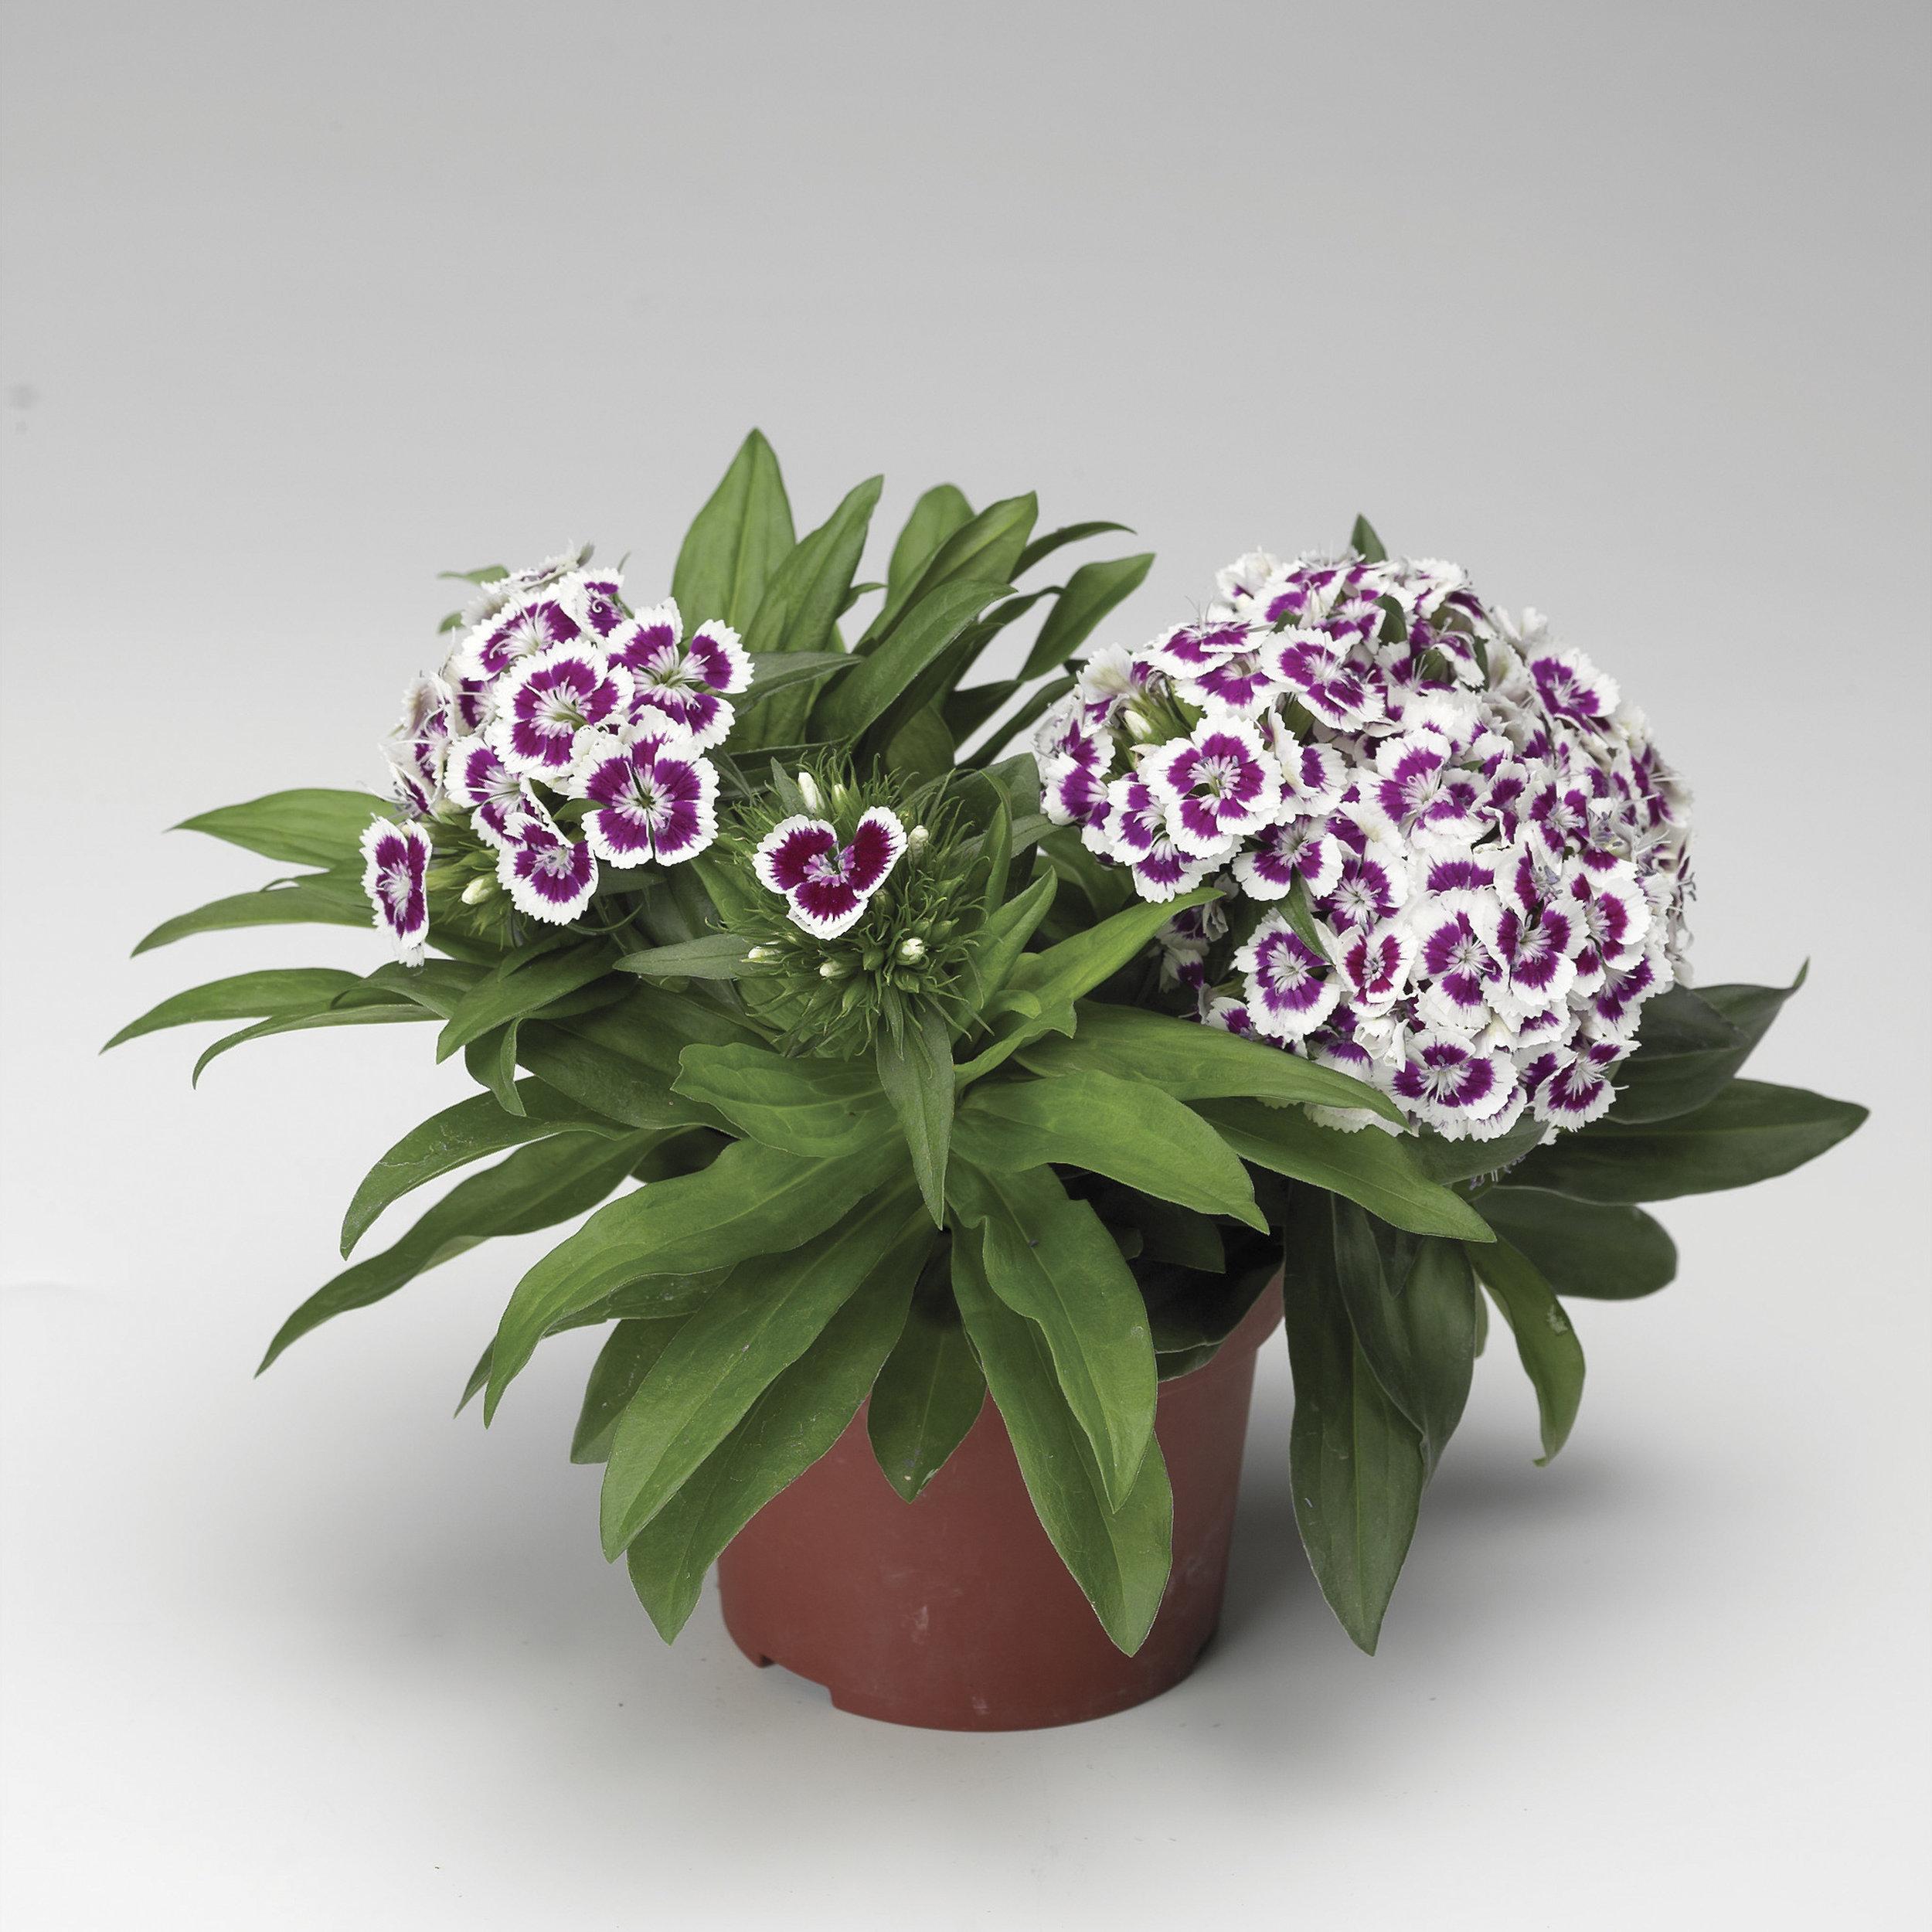 HR_Seed_Dianthus_Barbarini®_Barbarini®_Purple_Picotee_70001021.jpg